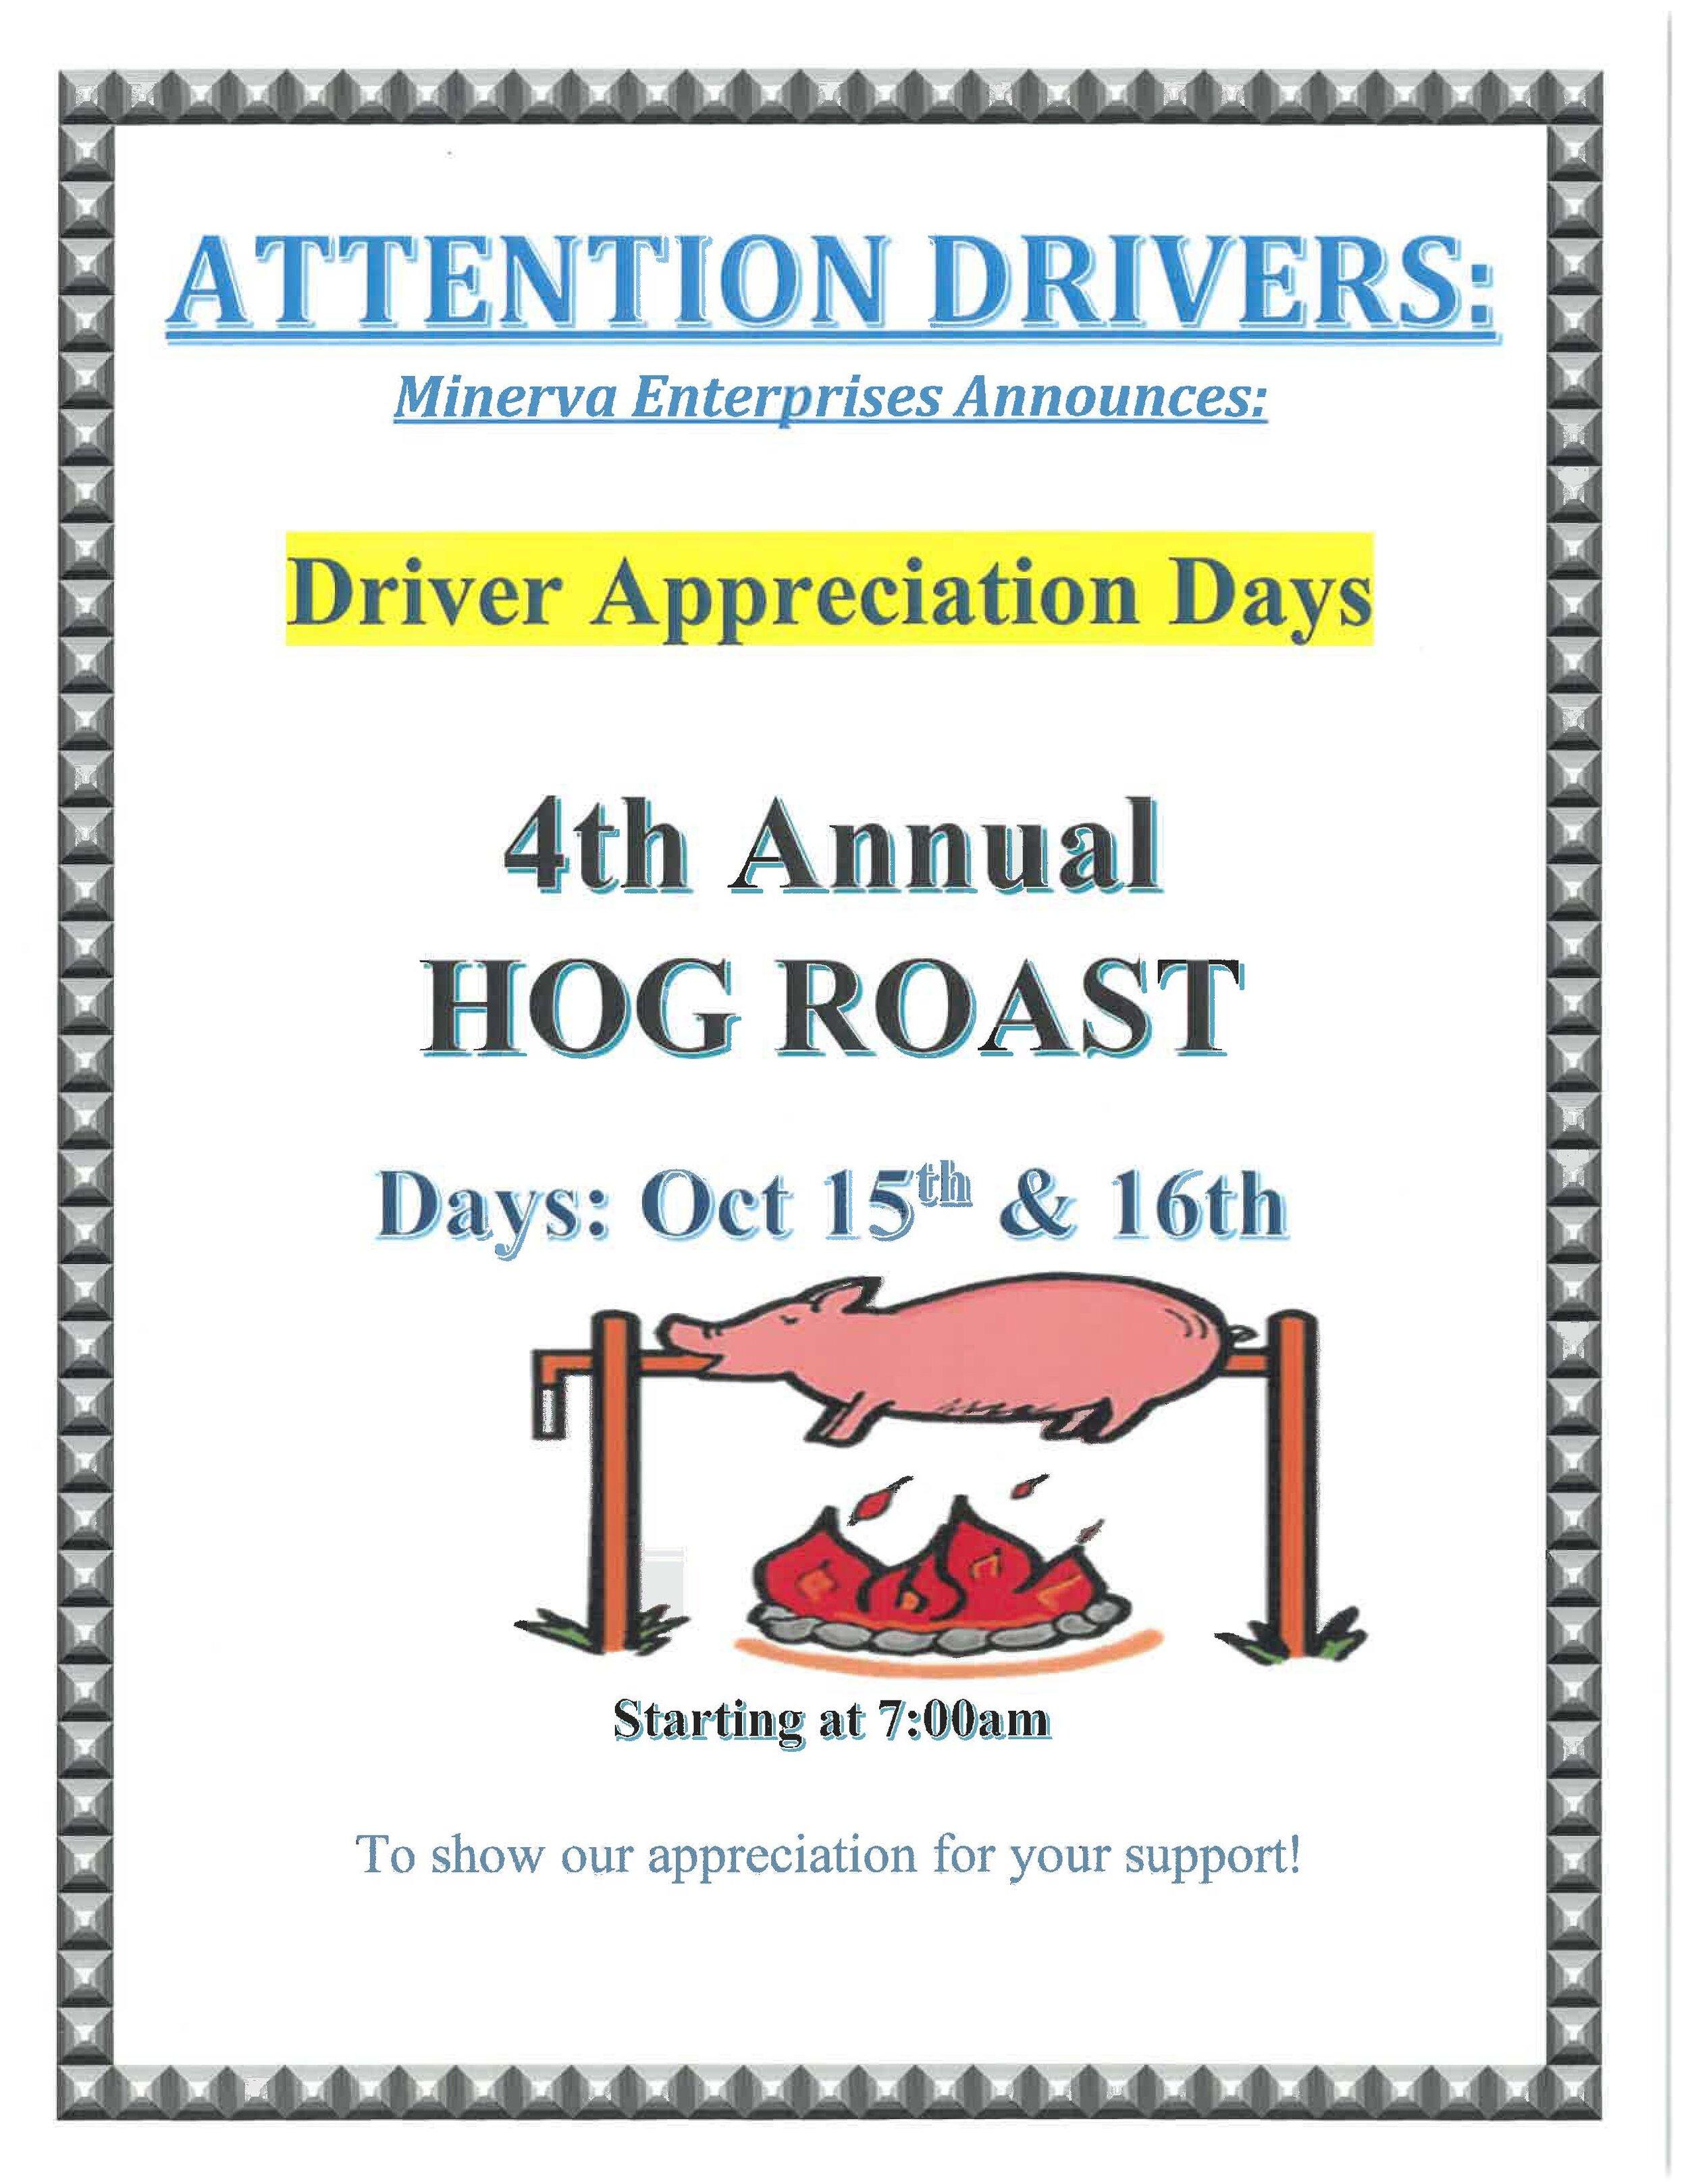 Minera 4th Annual Hog Roast.jpg